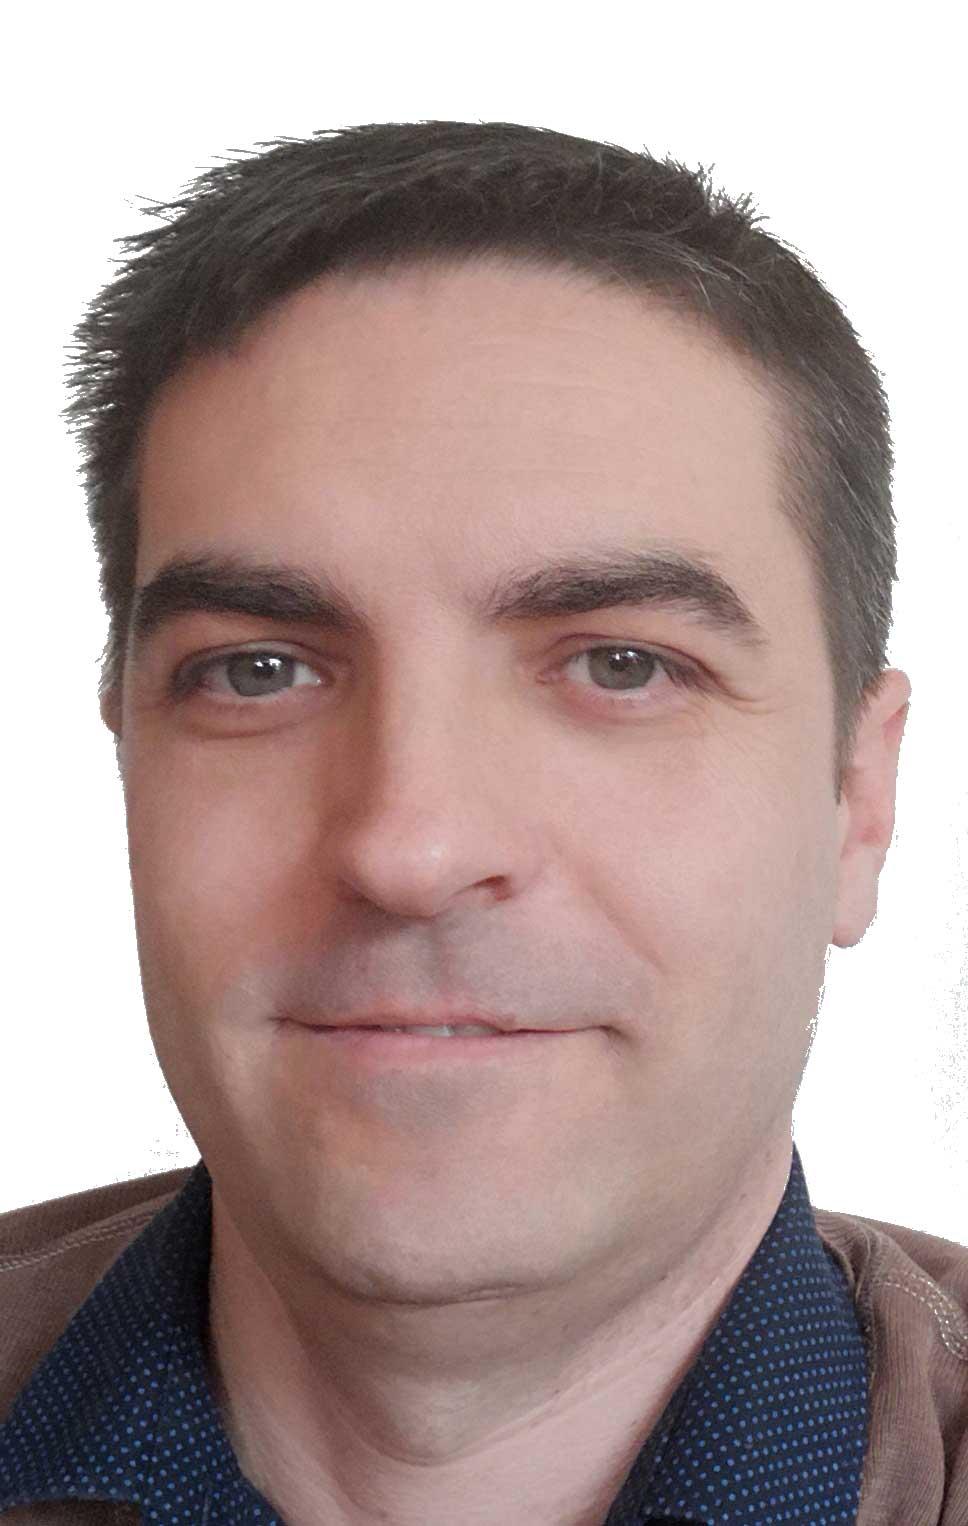 Juan Antonio Da Silva Irago